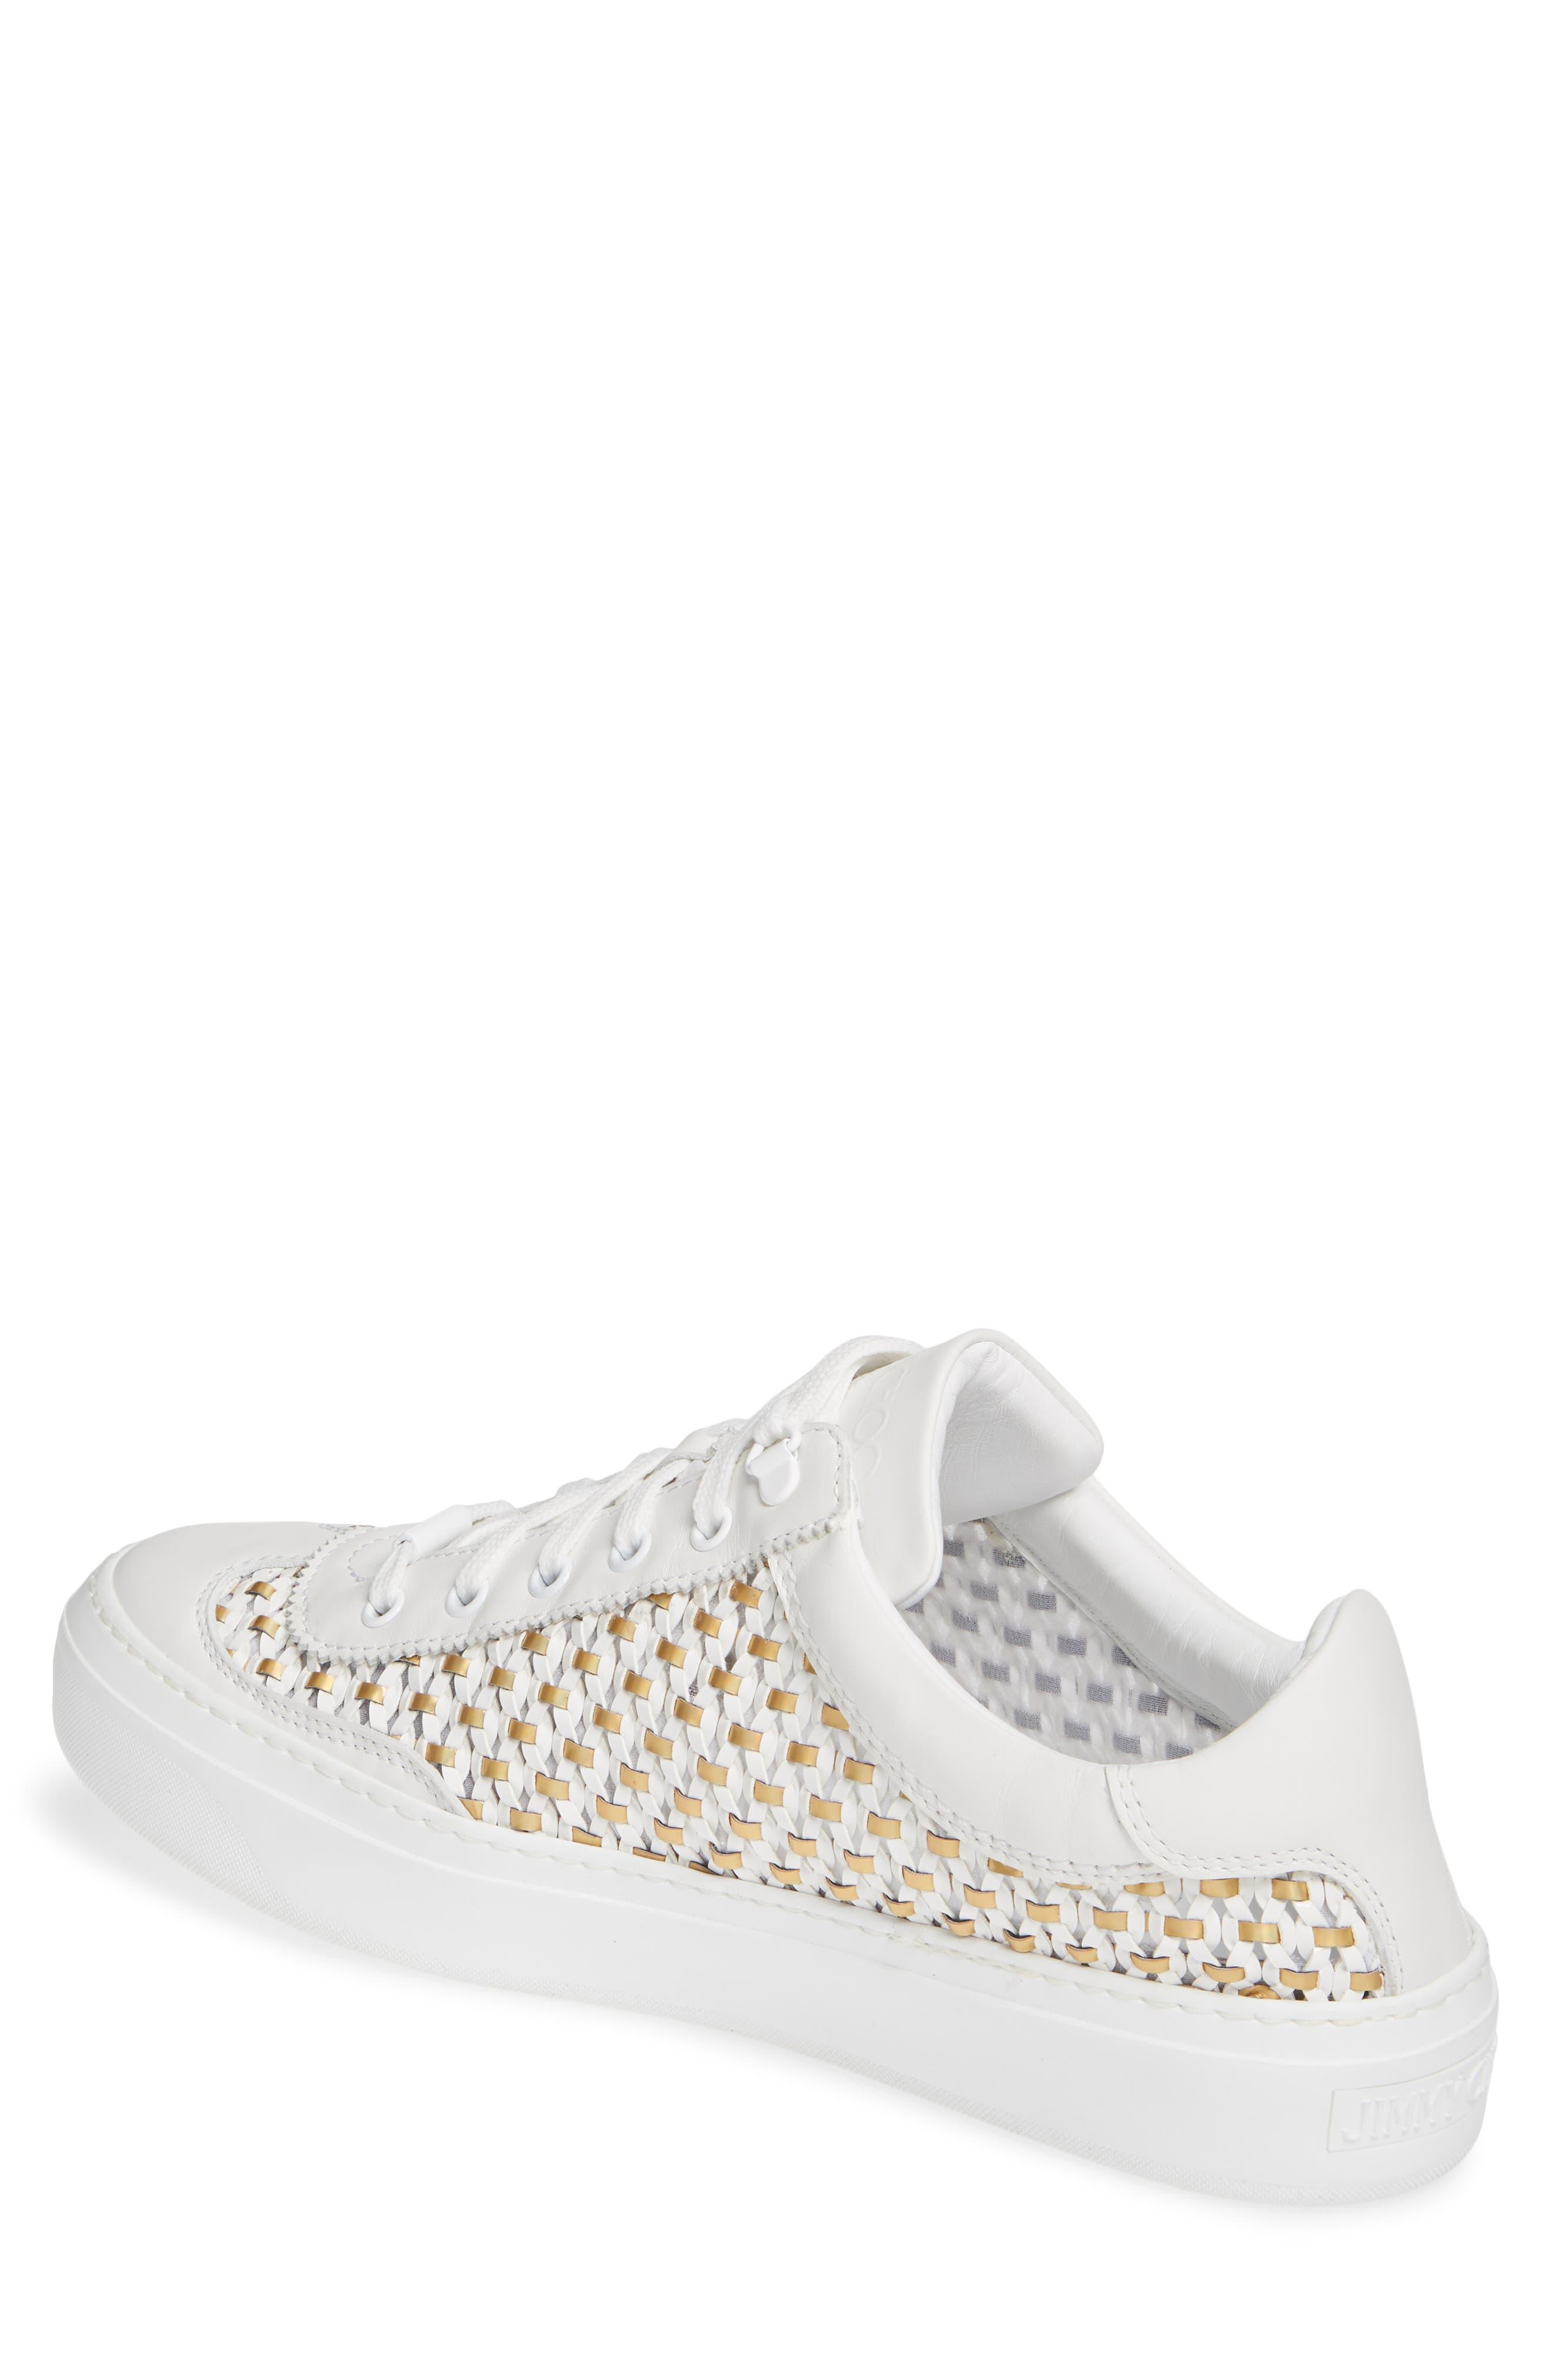 Ace Mux Sneaker,                             Alternate thumbnail 2, color,                             WHITE MIX